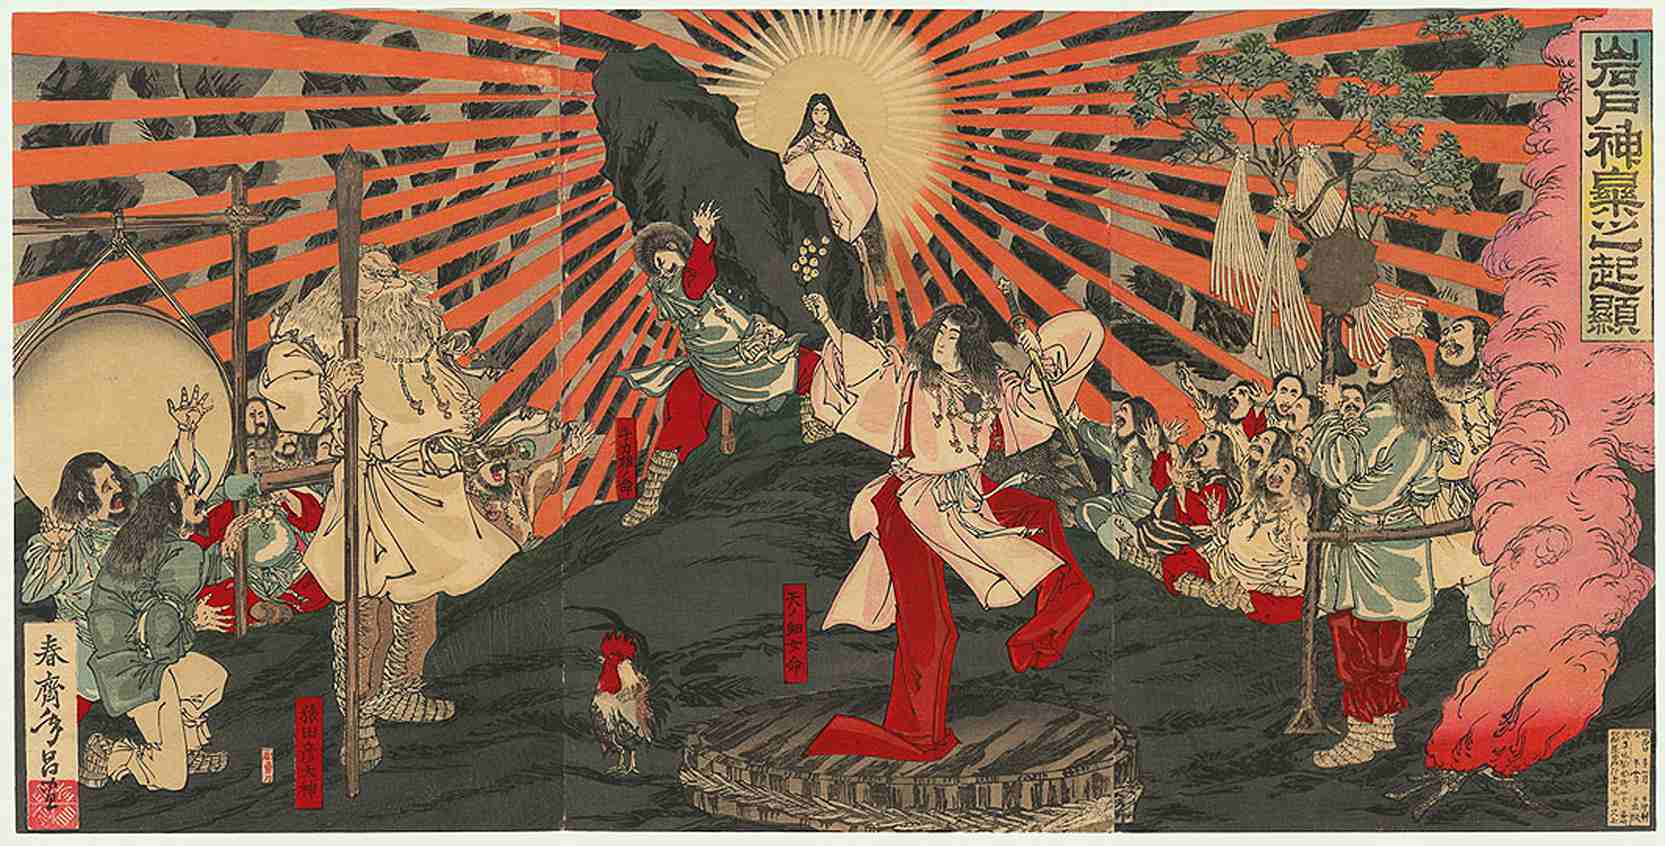 5 Dancing Deities in Mythology